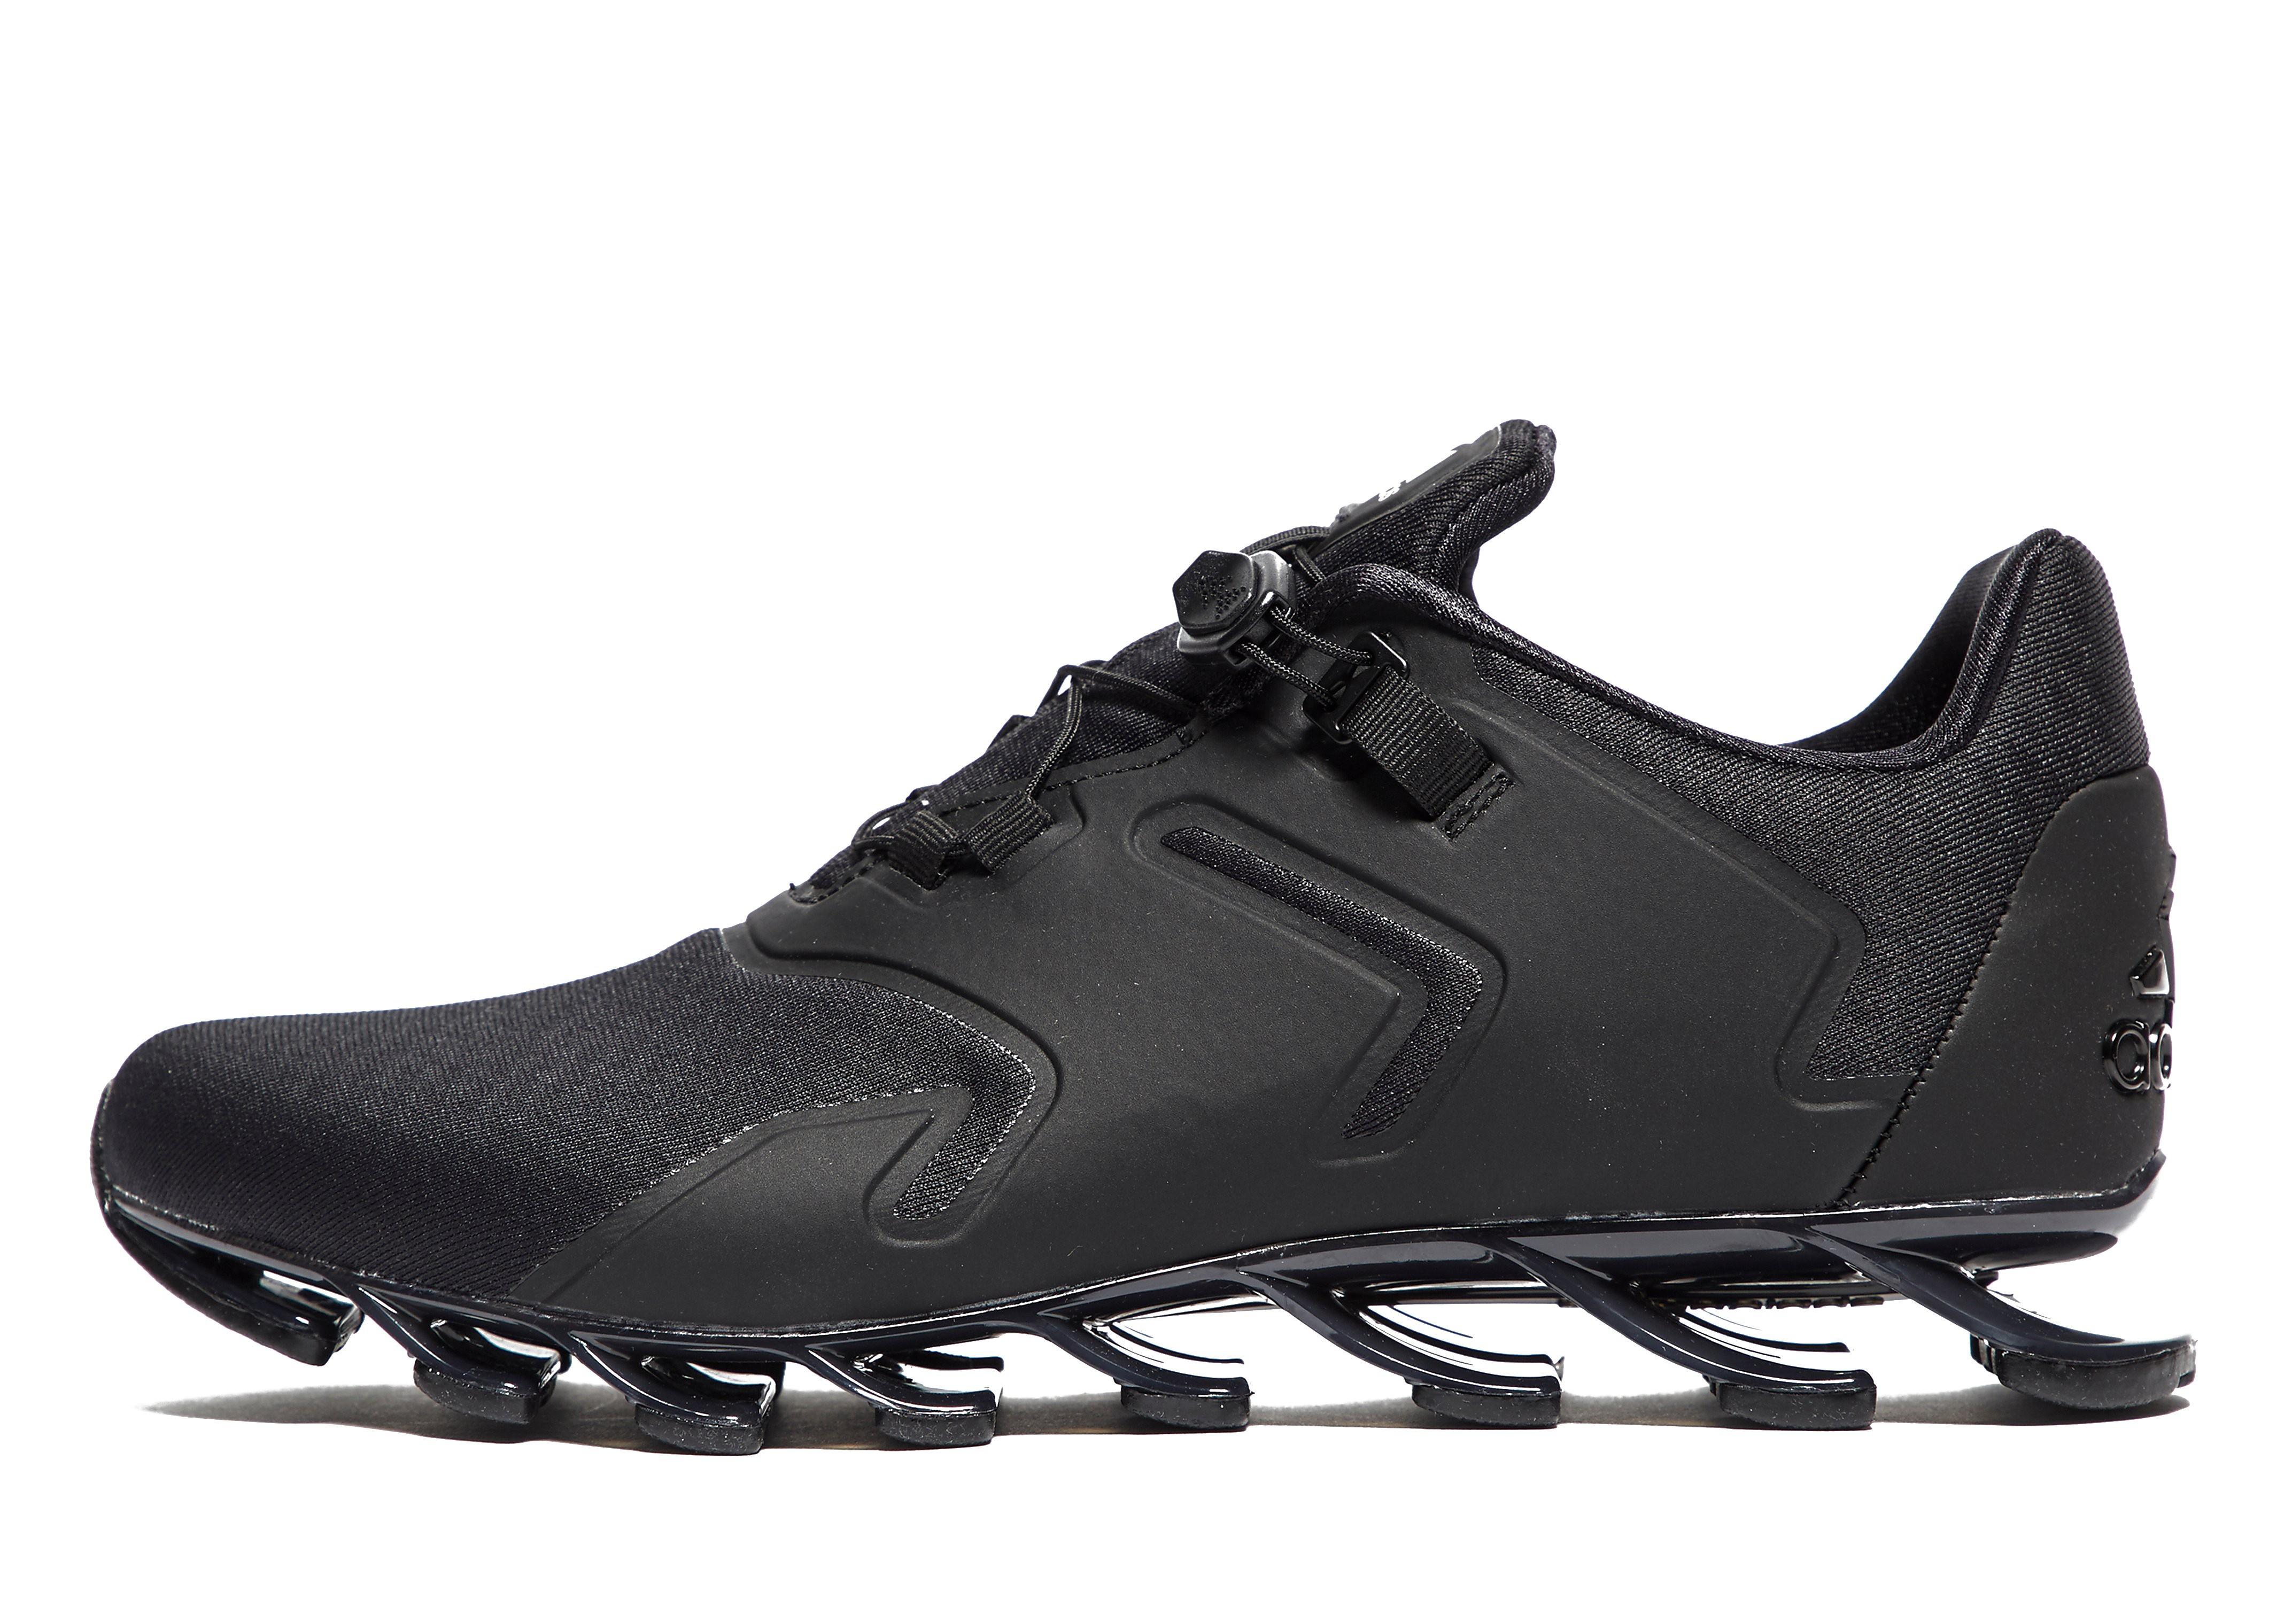 adidas adidas Springblade Solyce Running Shoes